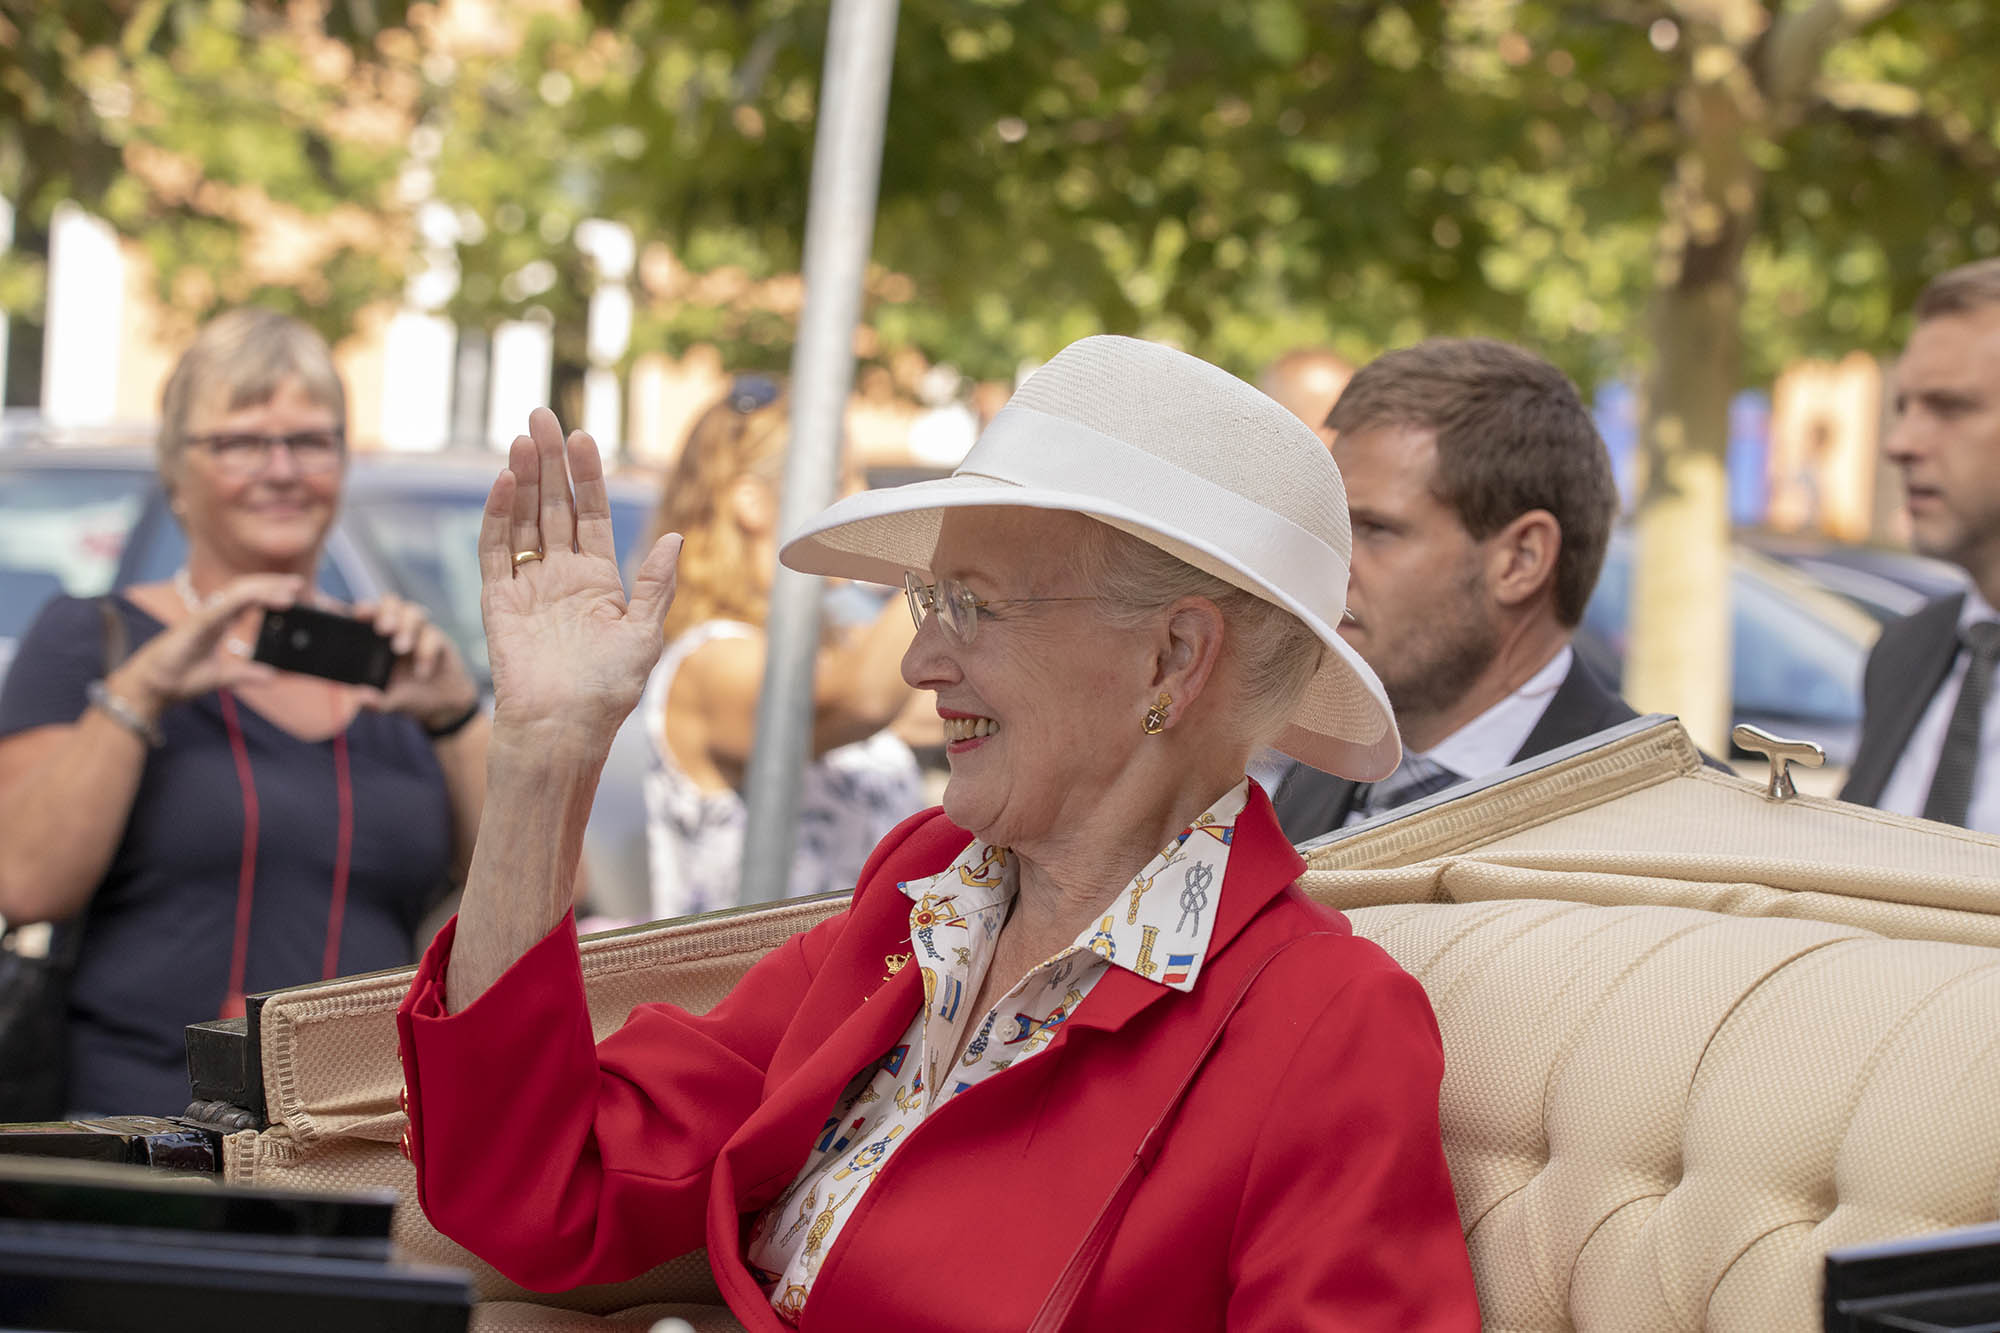 Dronning Margrethe | Maritimt klædt dronning i Svendborg